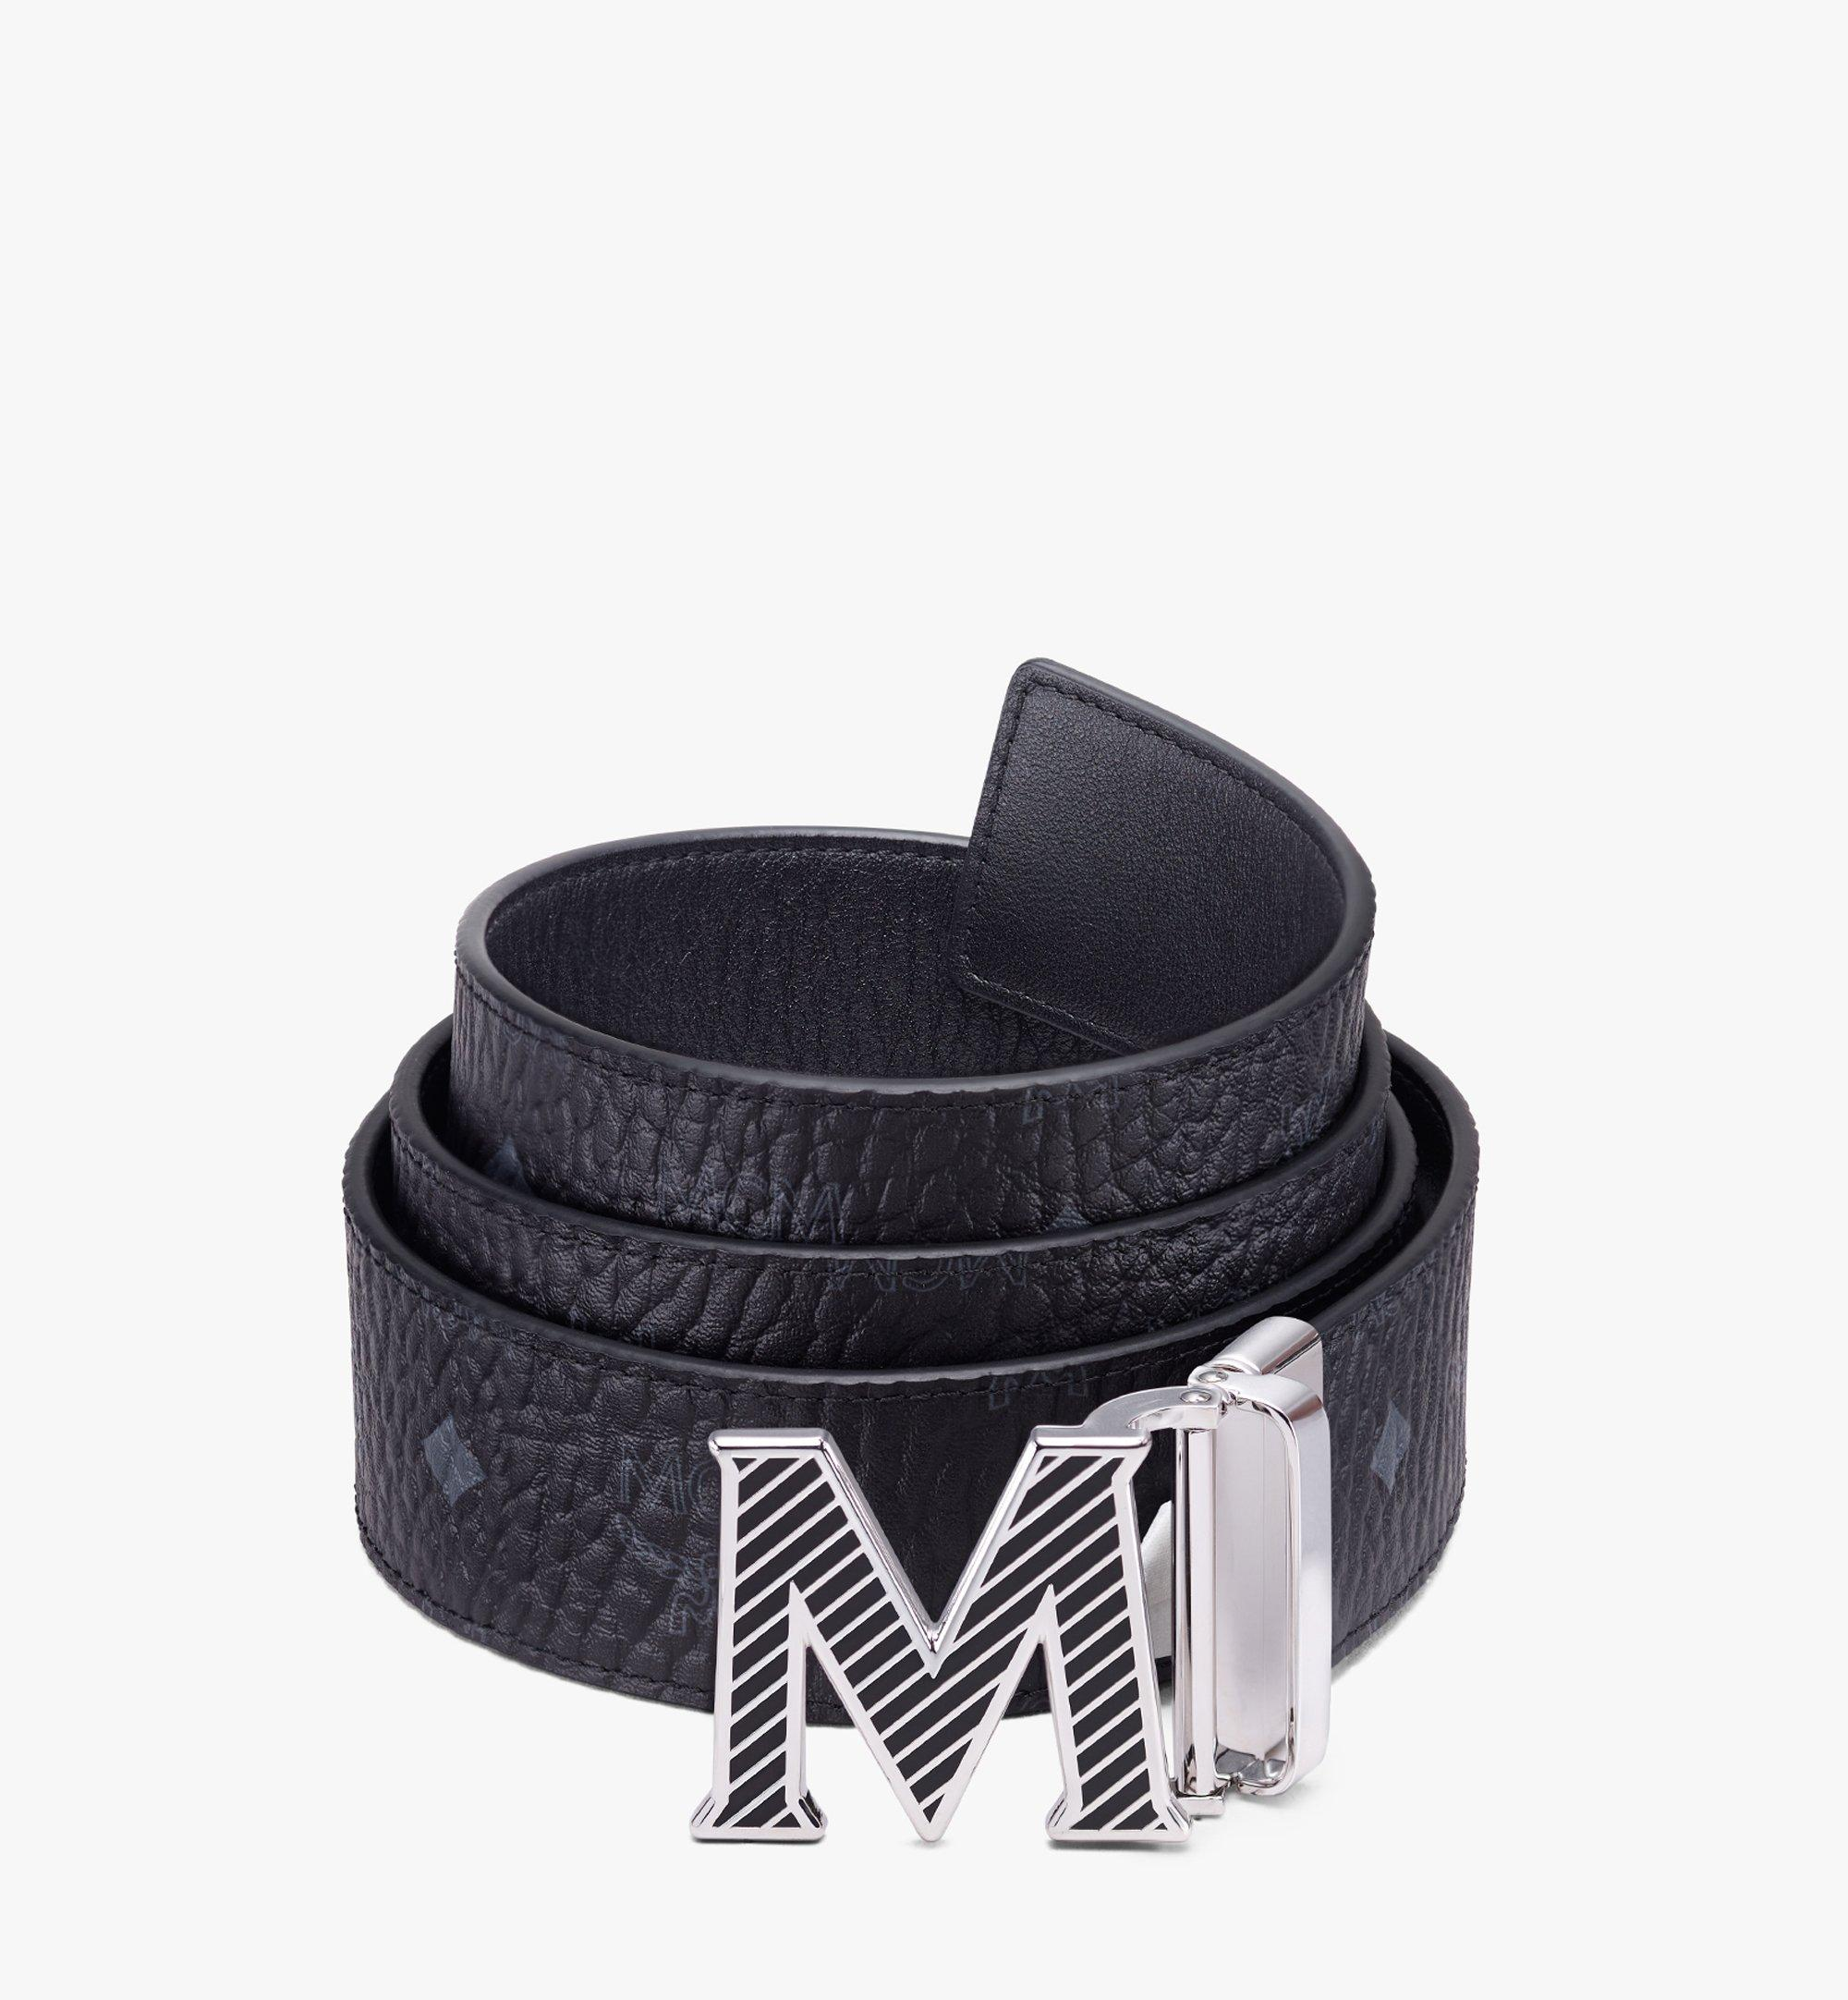 MCM Visetos皮革 Claus Oblique M 1.5 吋可翻轉使用皮帶 Black MXBASVI19BK001 更多視圖 1